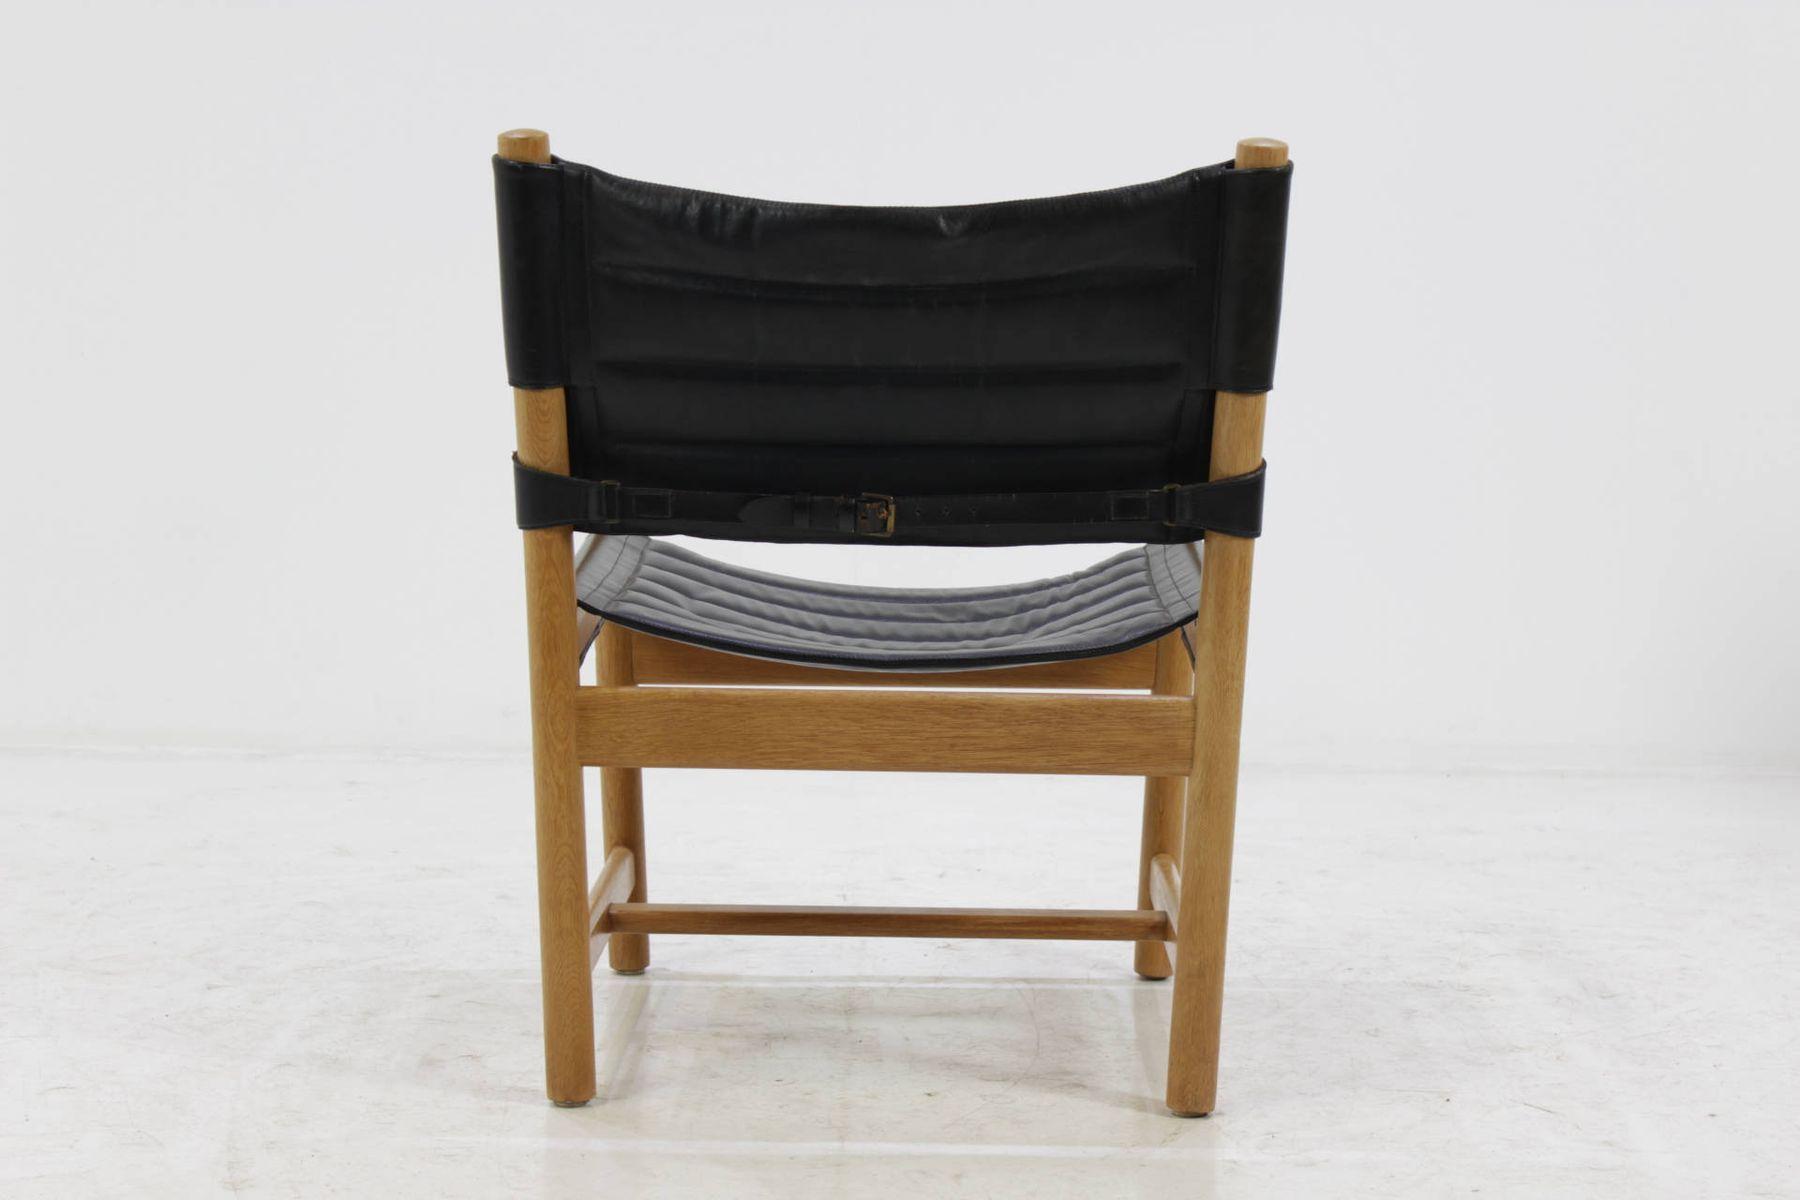 d nische schwarze leder armlehnst hle von ditte adrian. Black Bedroom Furniture Sets. Home Design Ideas